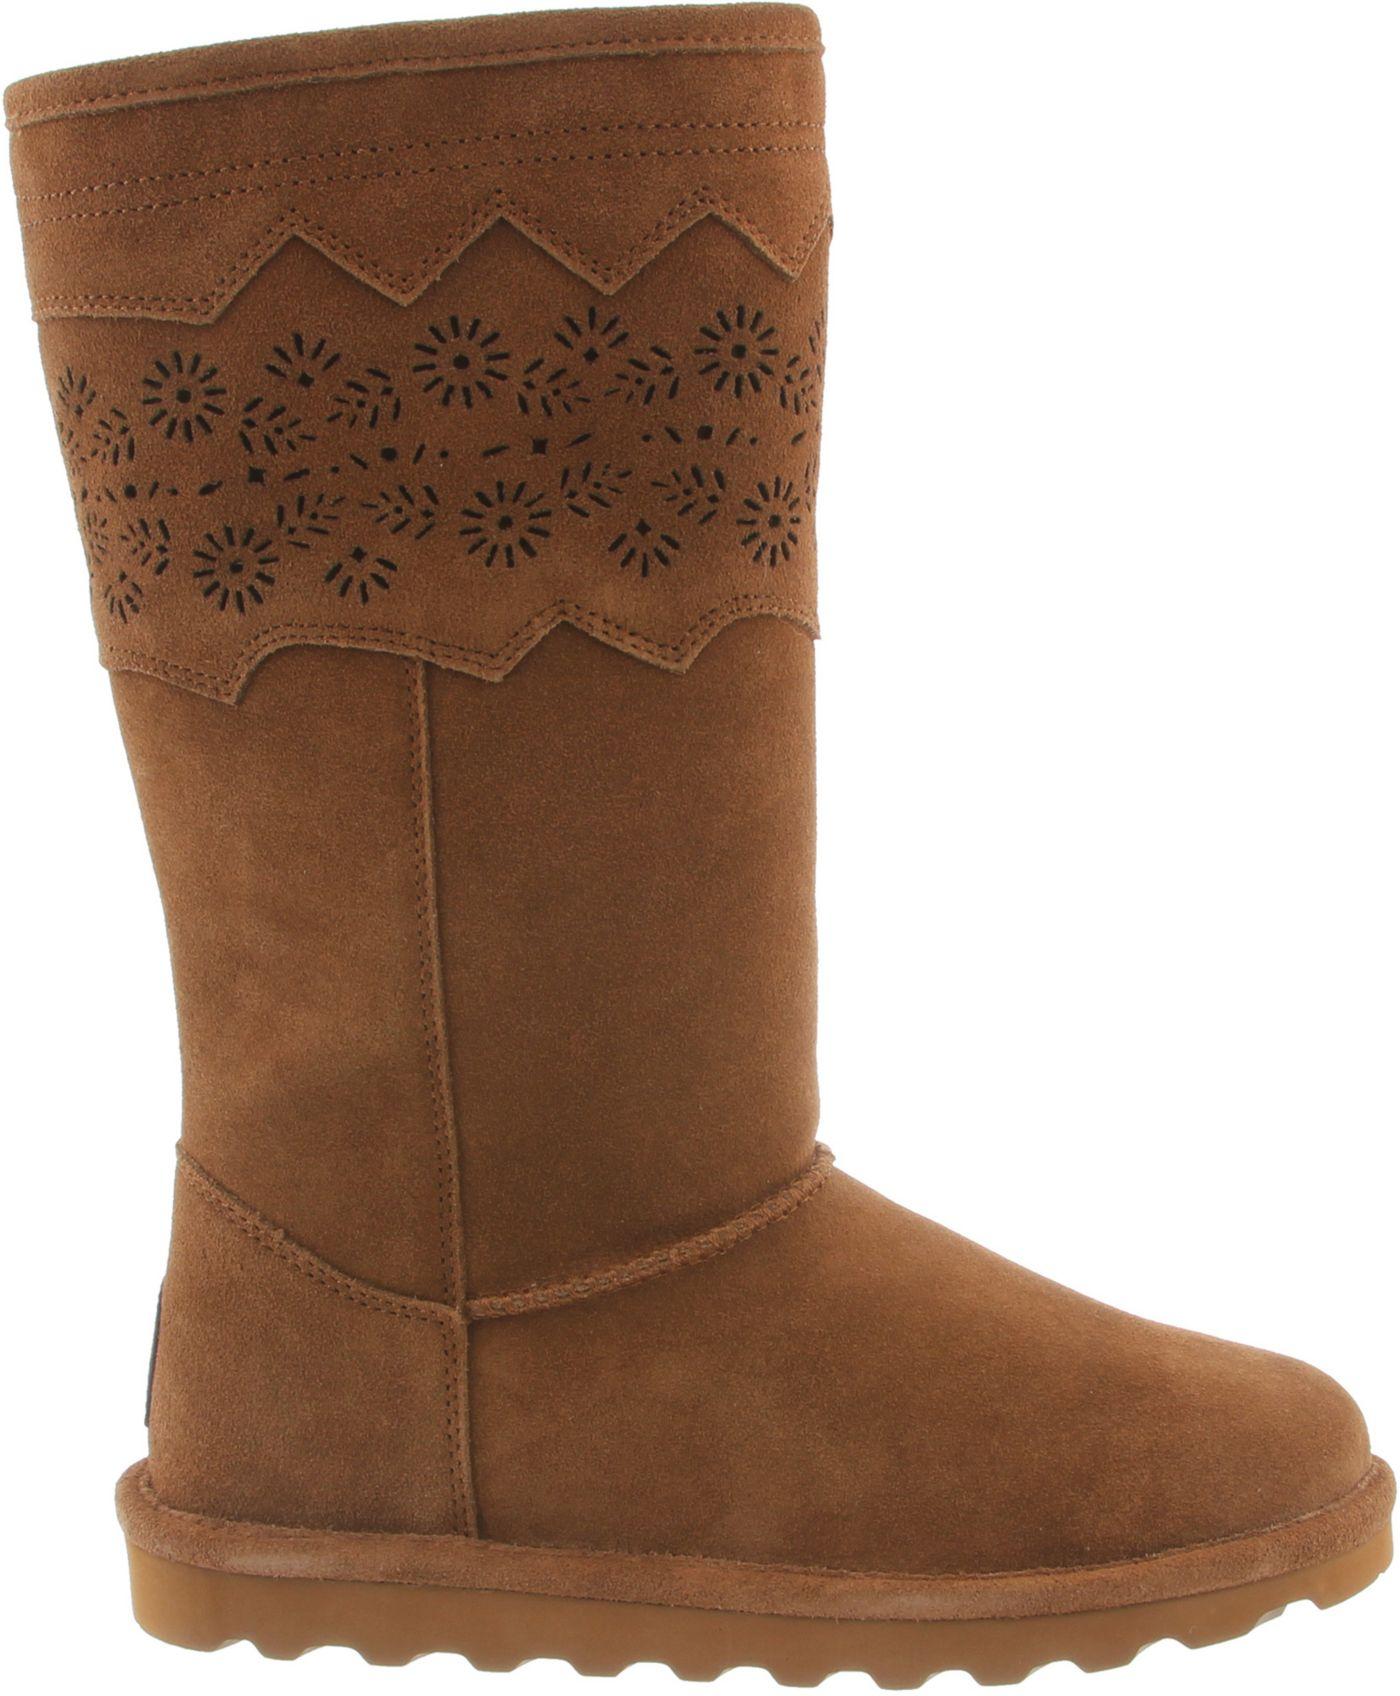 BEARPAW Women's Shana Winter Boots